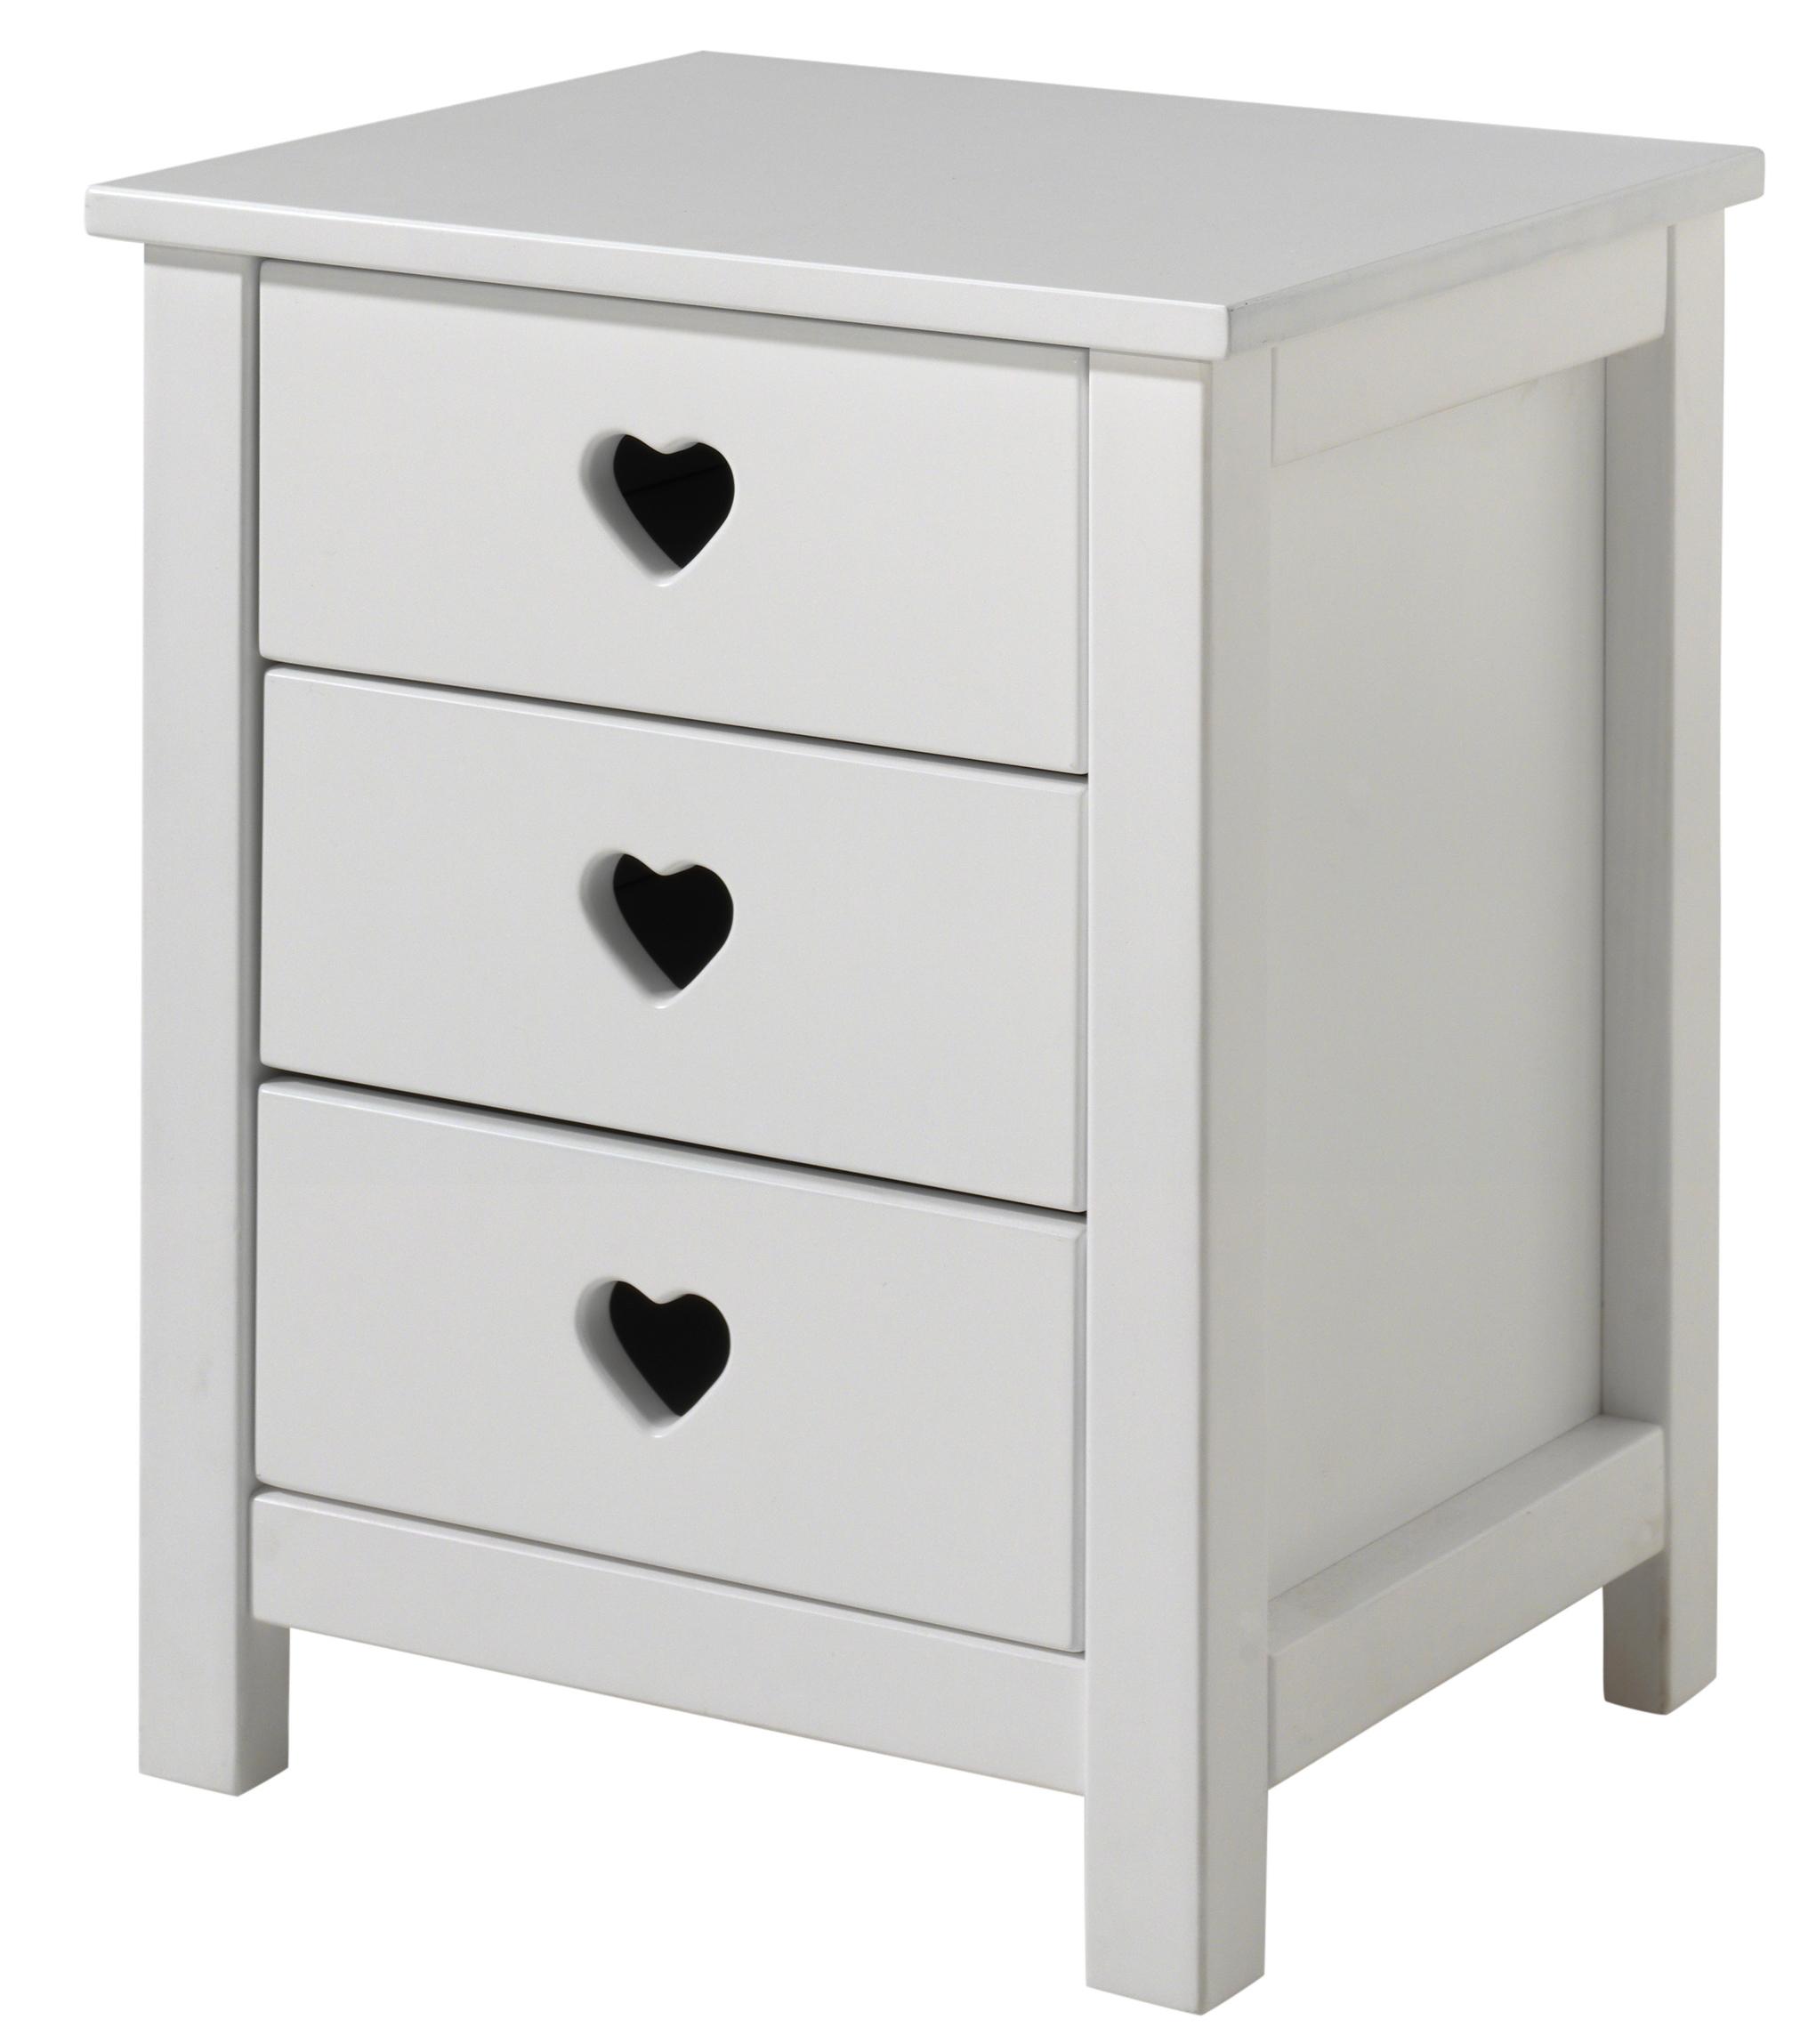 table de chevet 3 tiroirs laqu blanc coeur. Black Bedroom Furniture Sets. Home Design Ideas